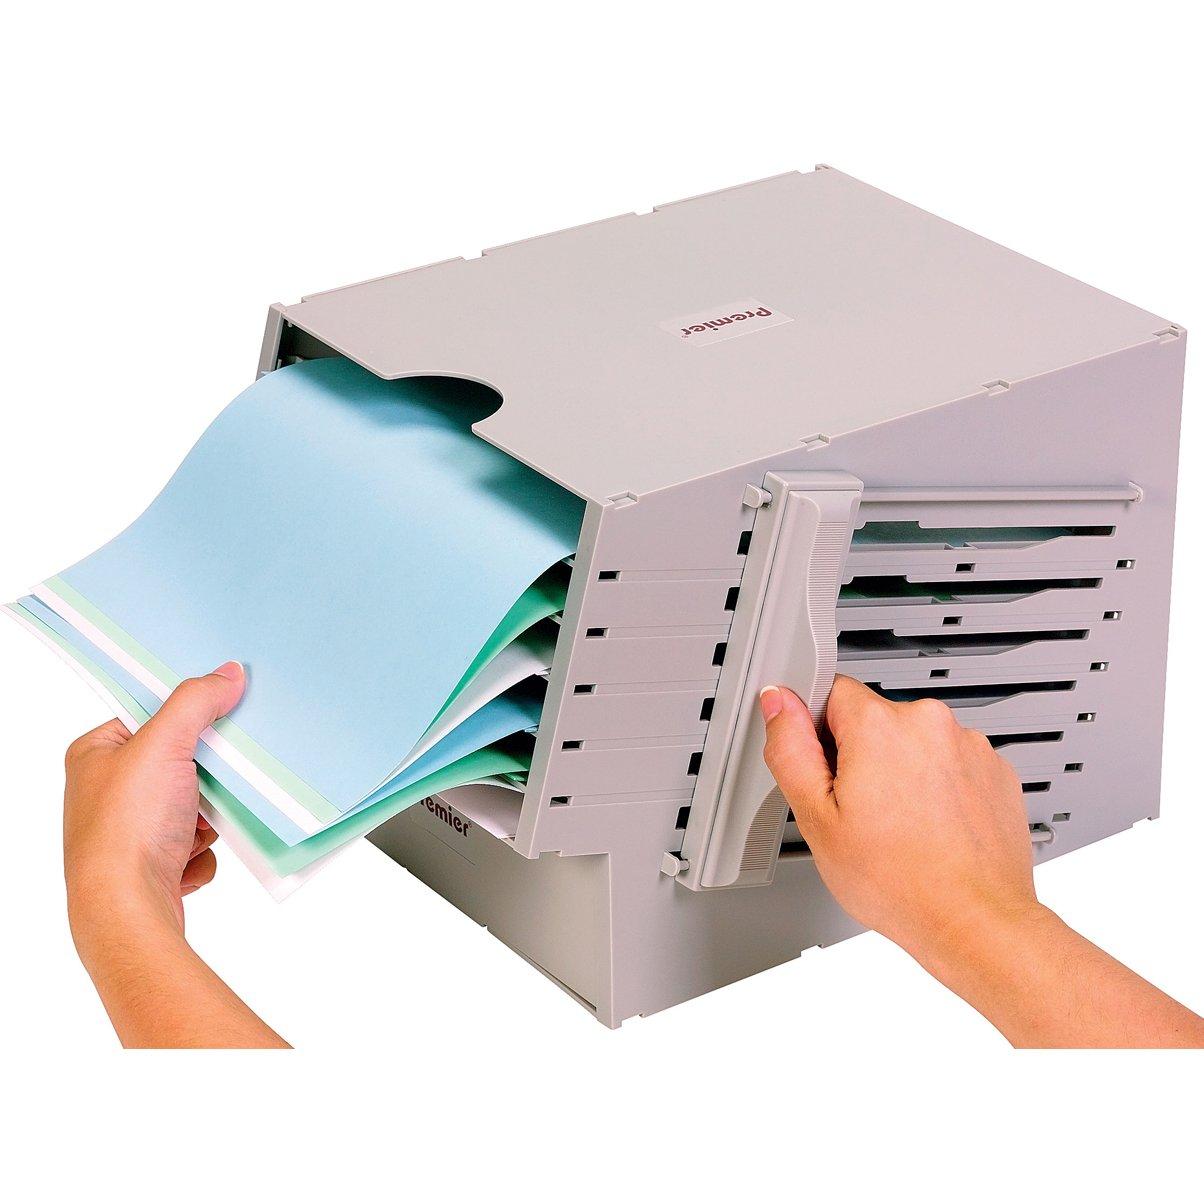 Amazon.com : Martin Yale CL6 Manual Collator : Multifunction Office  Machines : Electronics